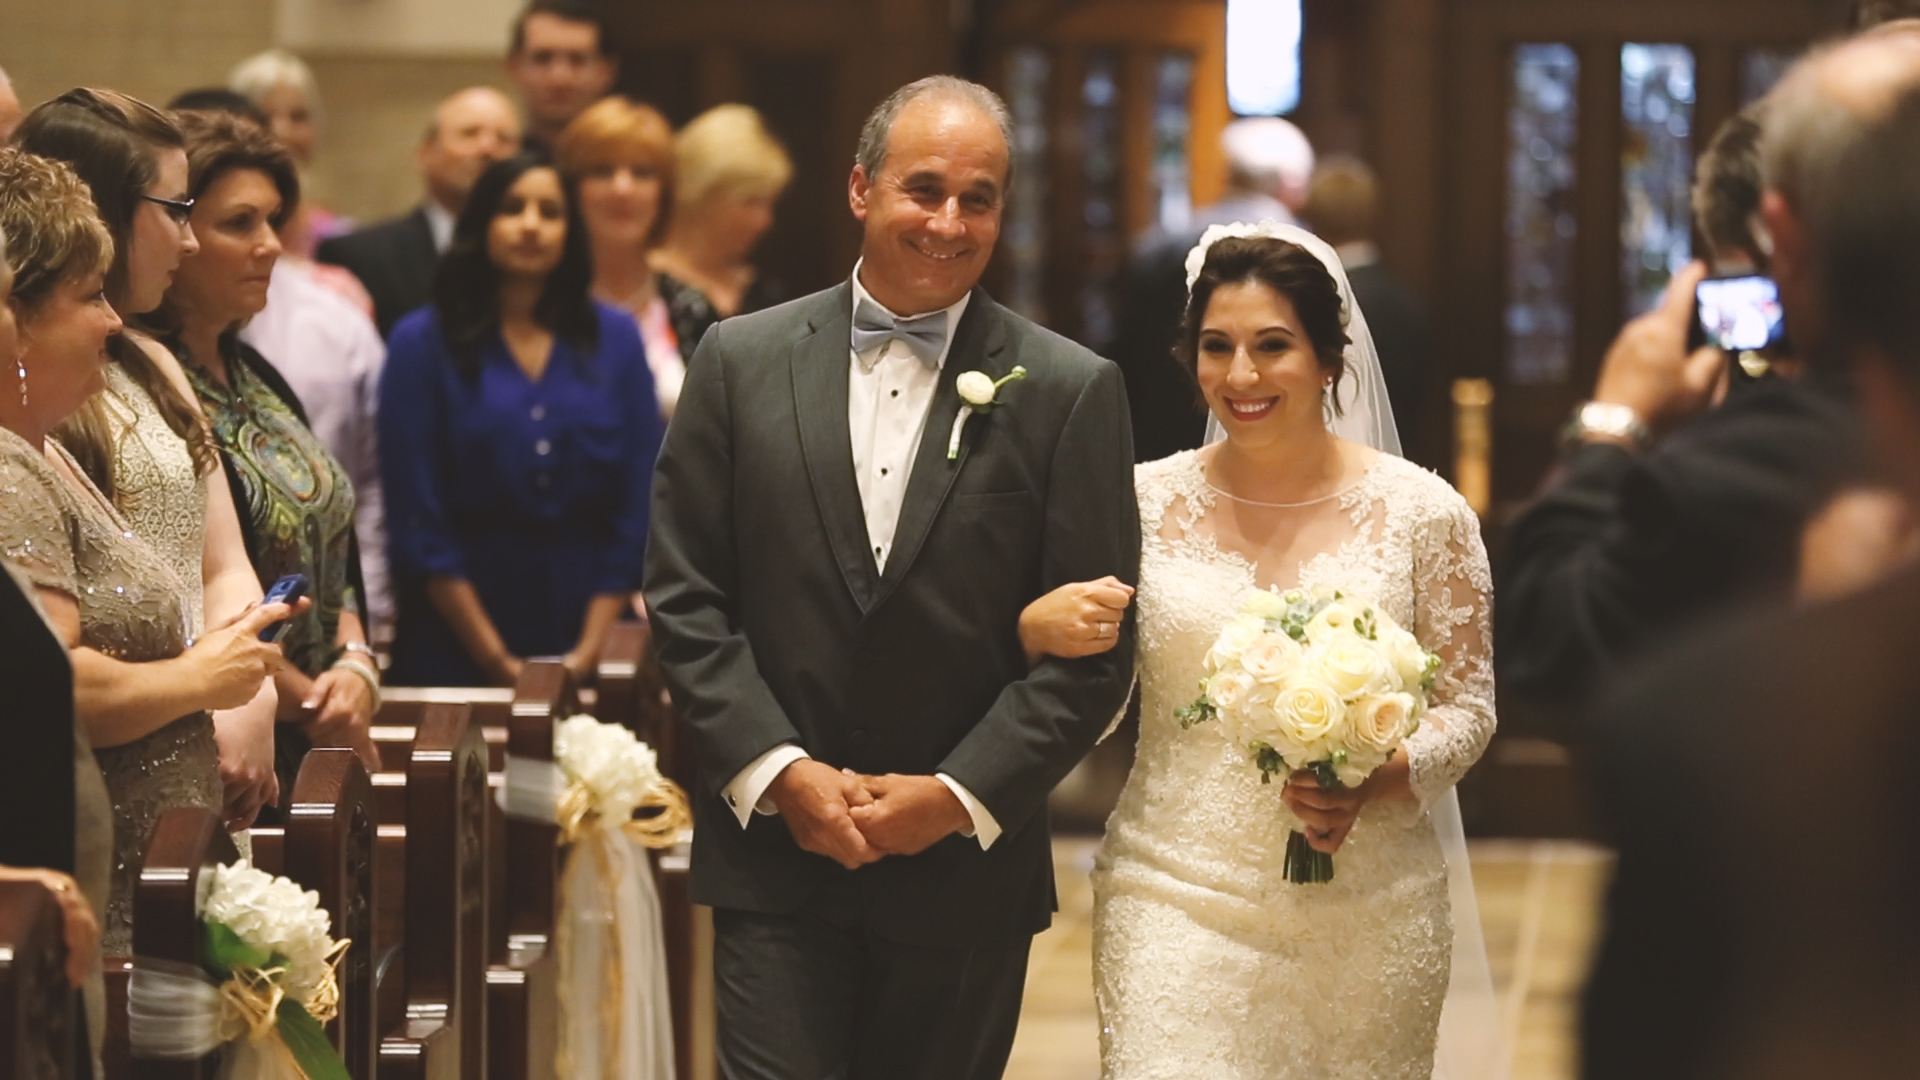 Bridal Procession - Bride Film